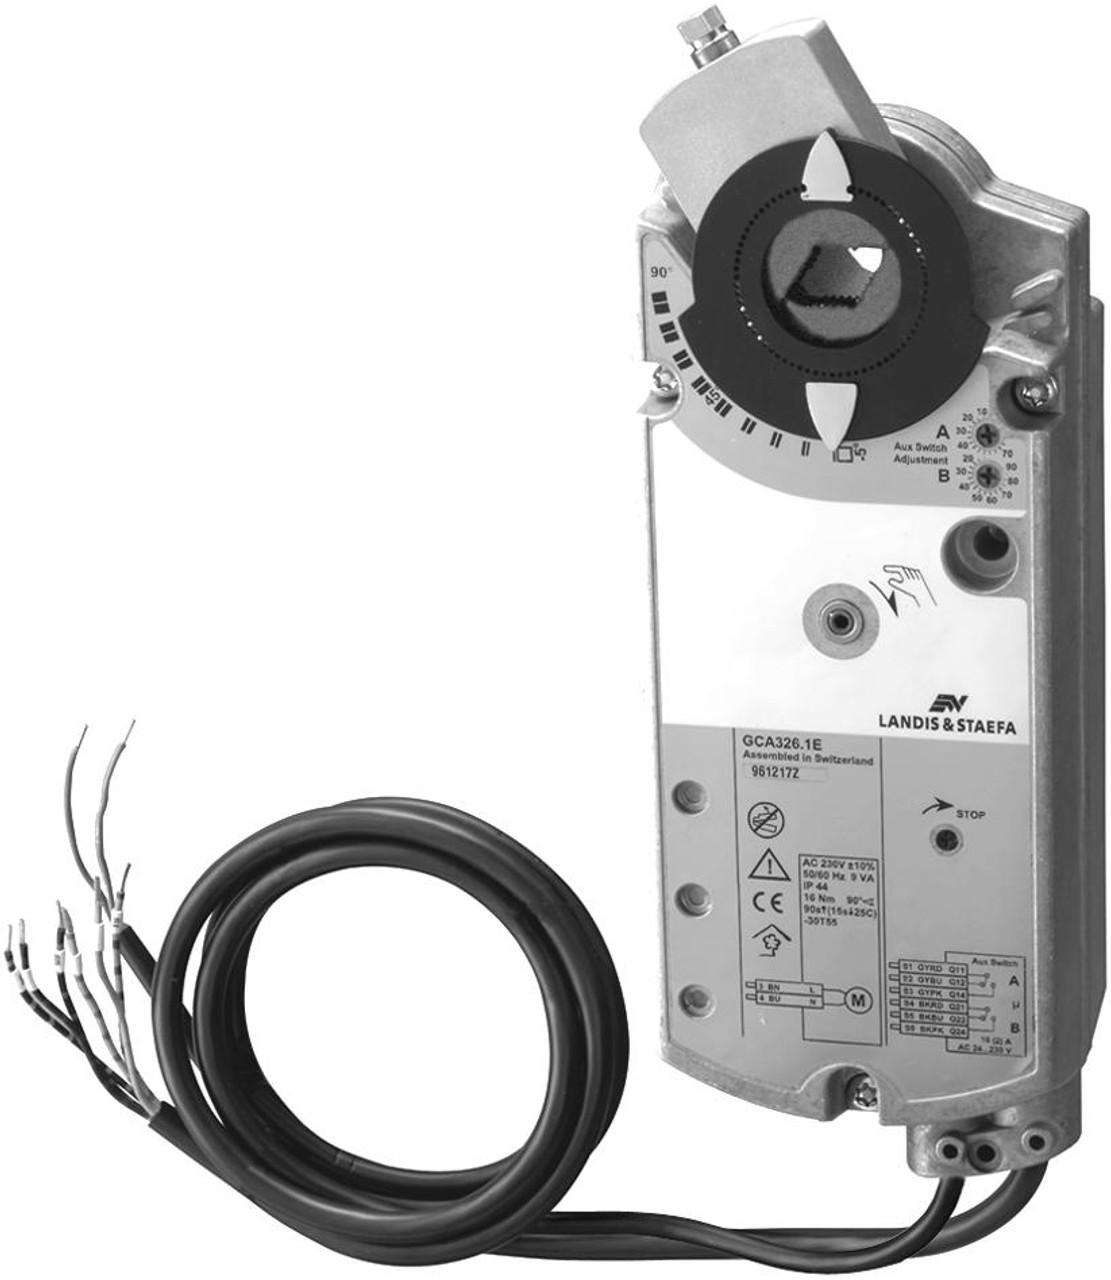 GCA161.1E rotary air damper actuator